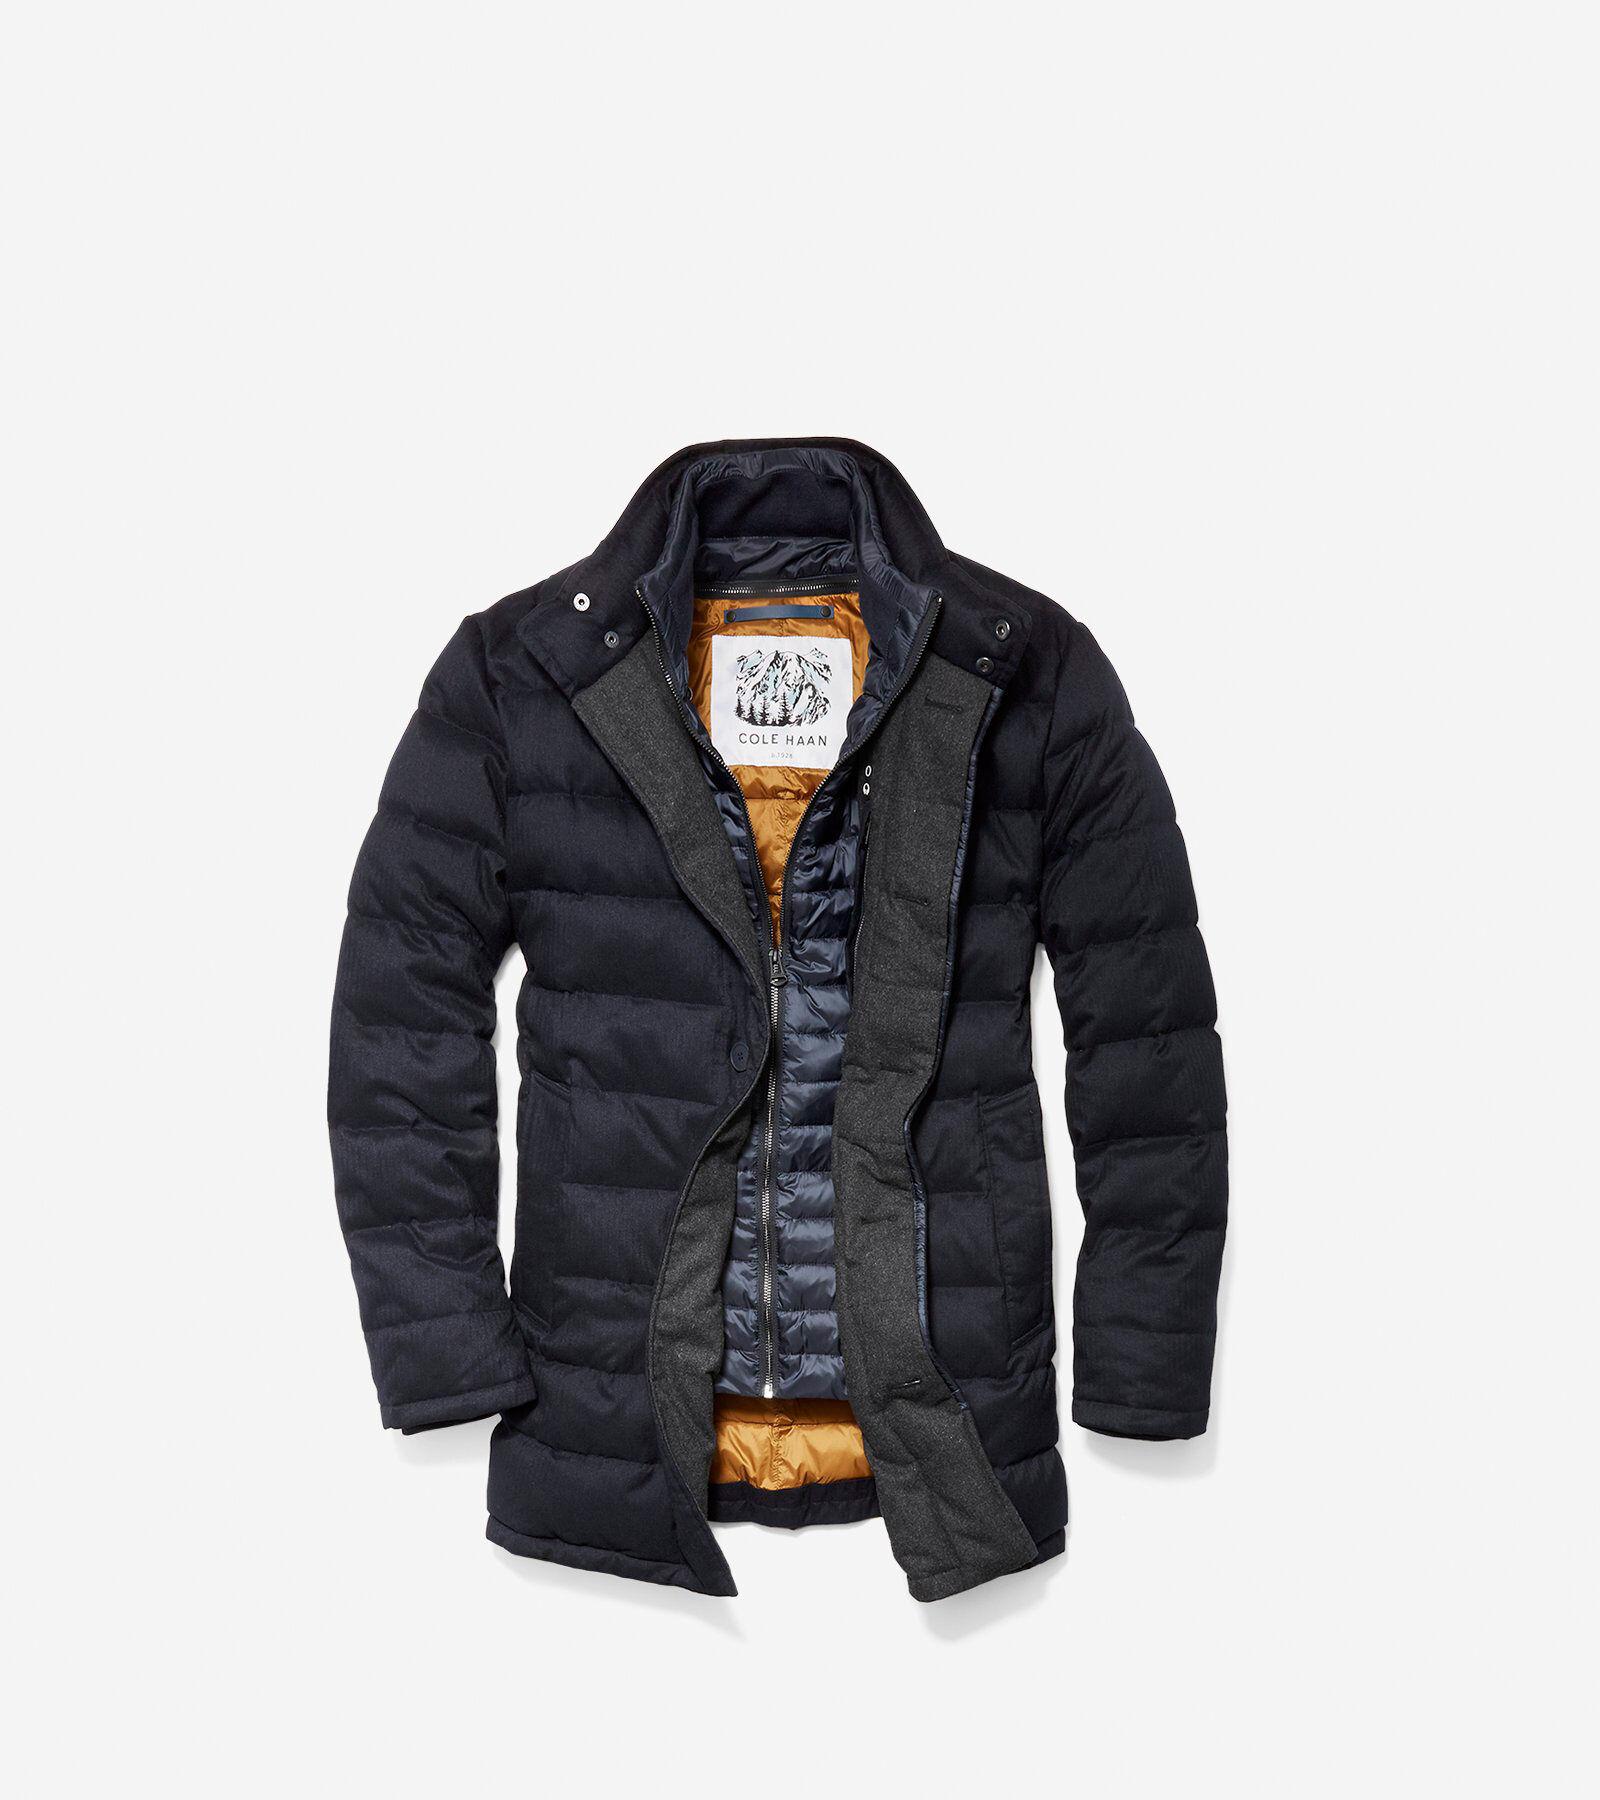 2018 Men Down Coat Winter Jacket Outwear Overcoat Ultralight Warm Fashion Stand Collar Travel Pocketable Portable Down Jackets